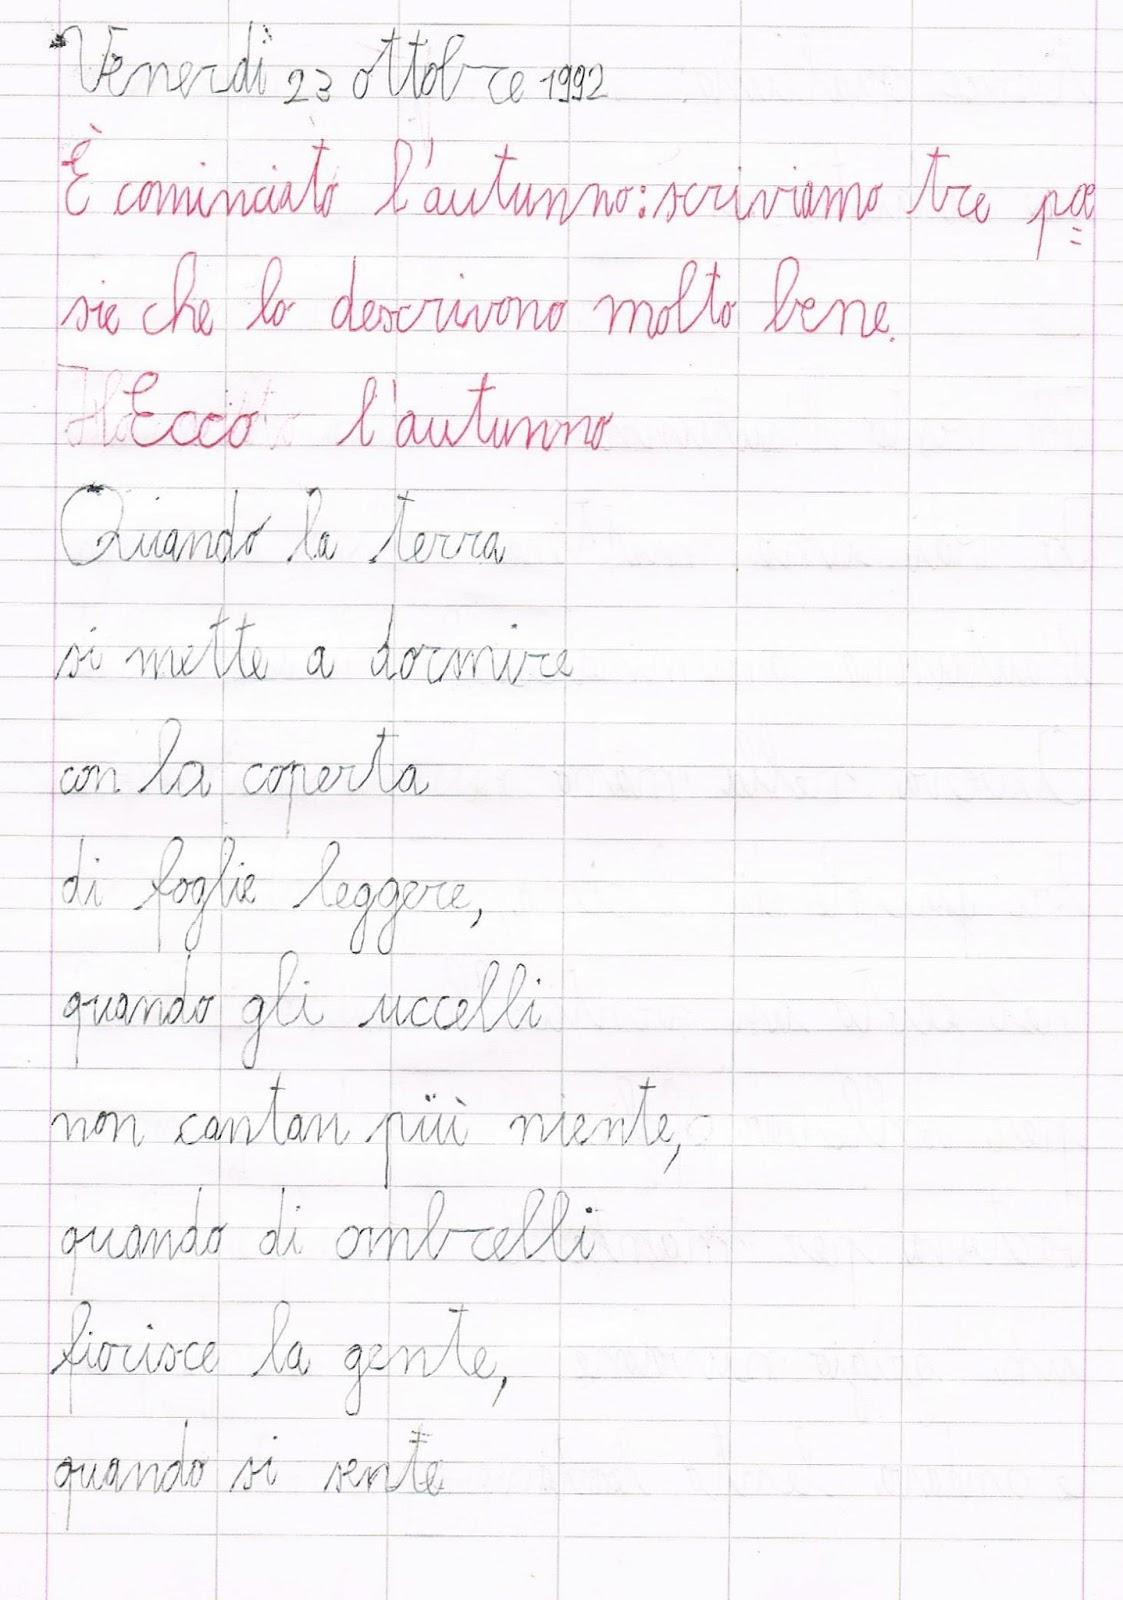 Preferenza Poesie sull'autunno LM66